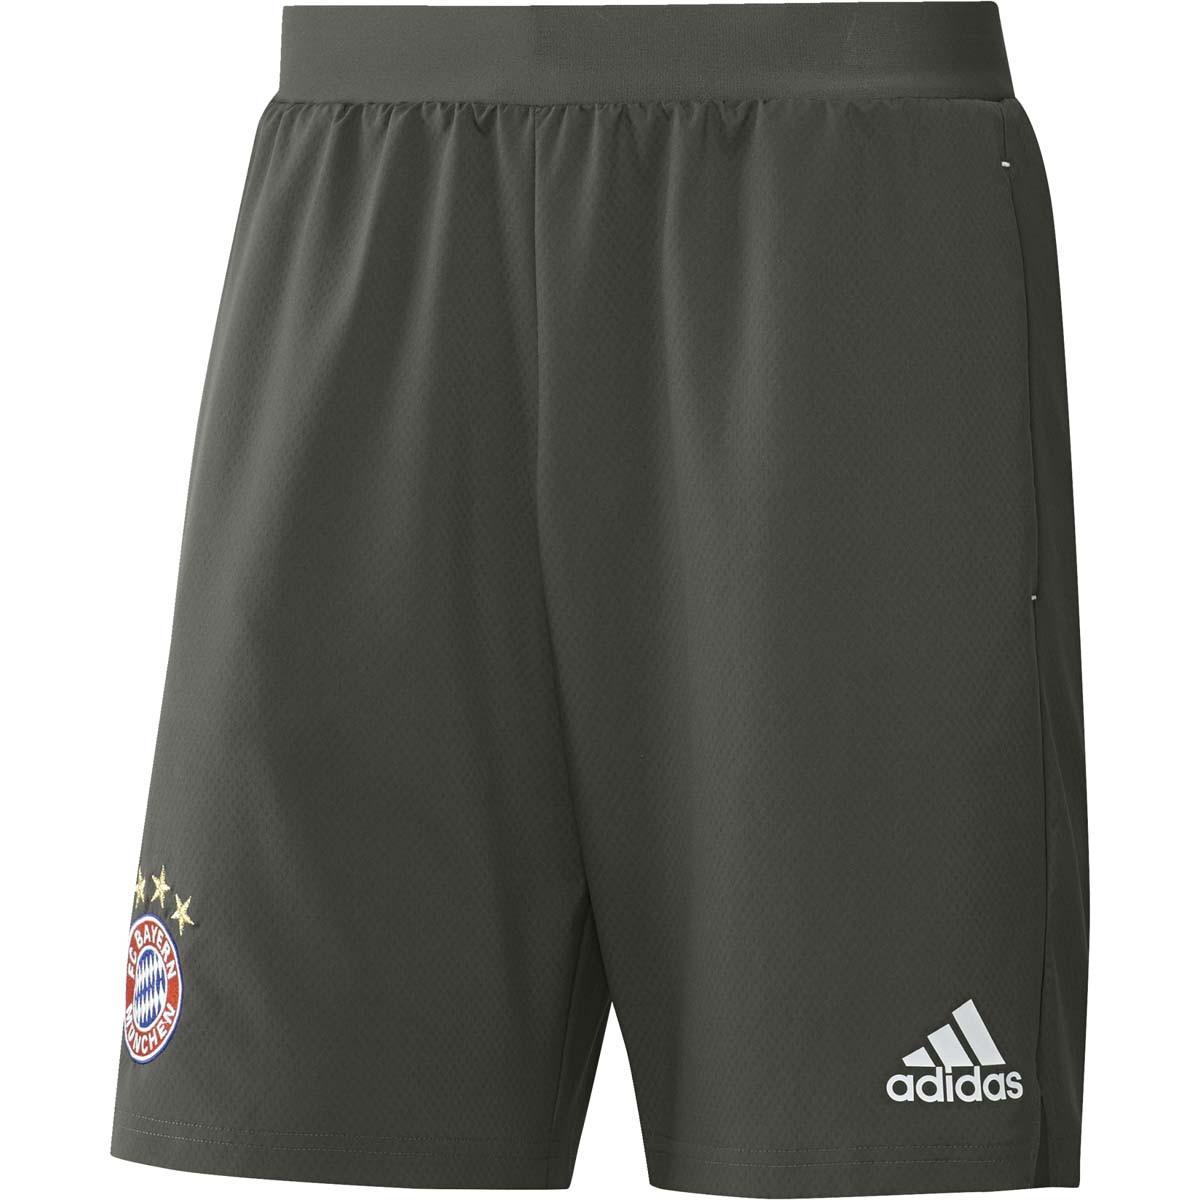 Trg Gris Adidas 20172018 Rayon Eu Bayern Short BexCoWrd